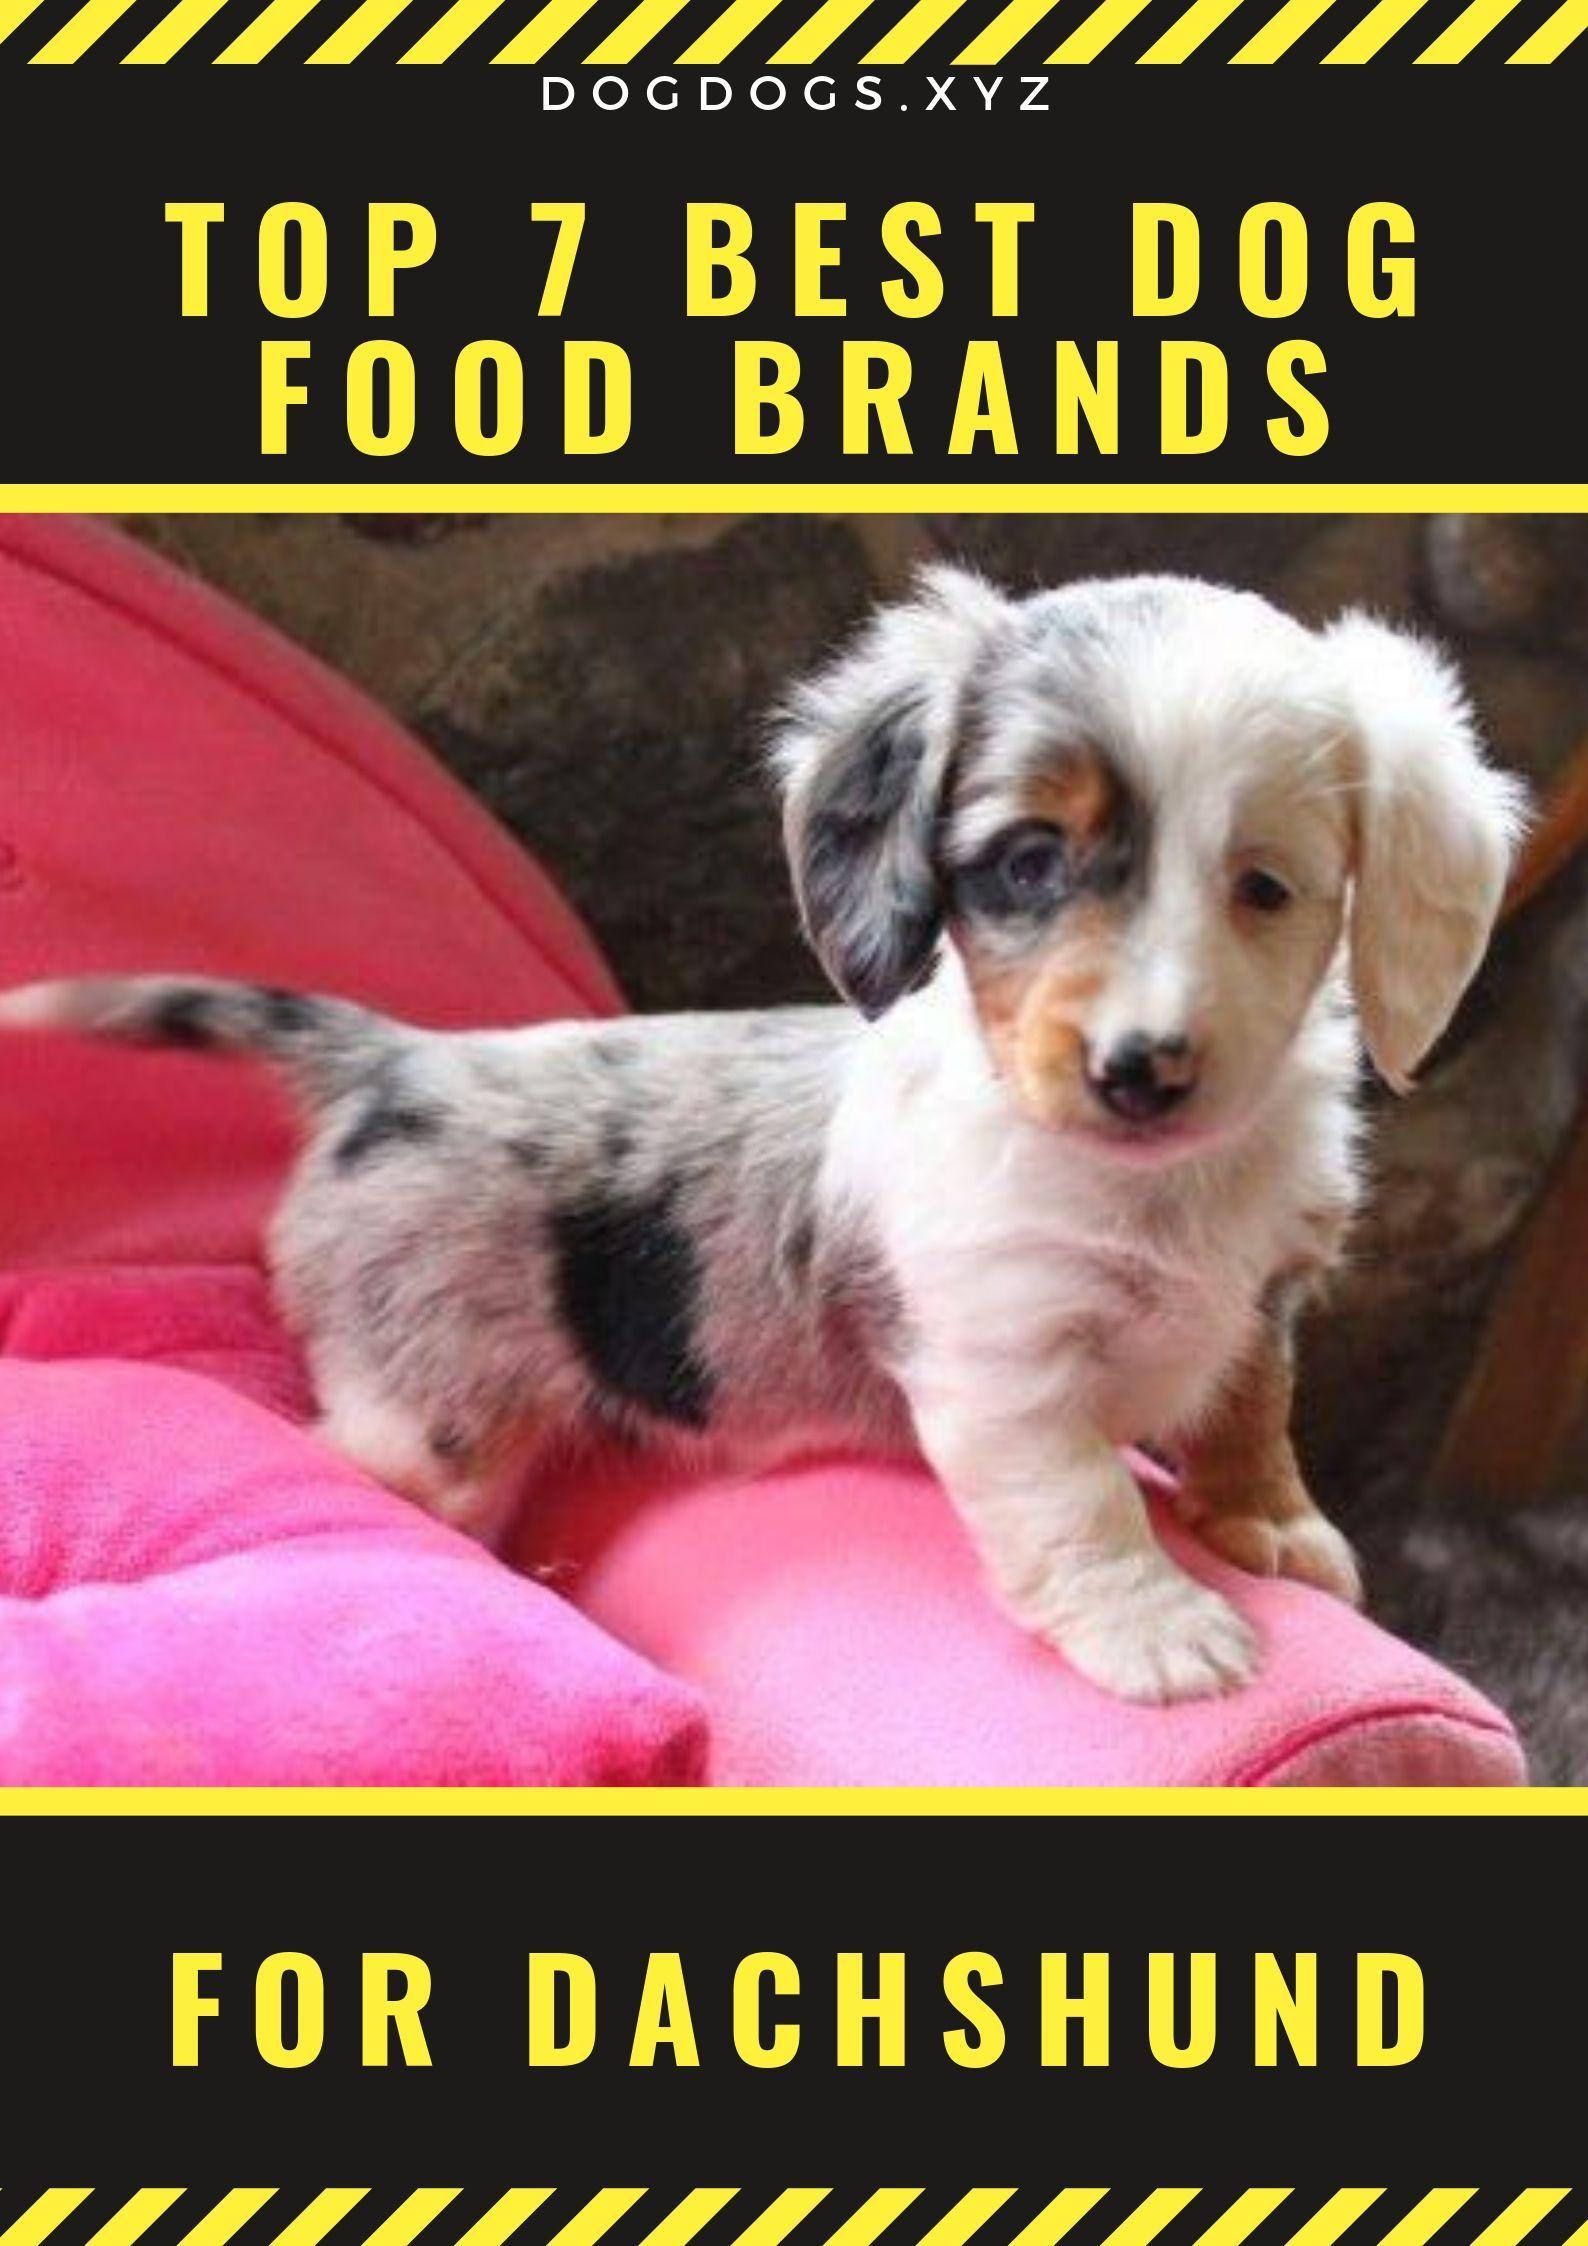 Top 7 Best Dog Food Brands For Dachshund Best Dog Food Brands